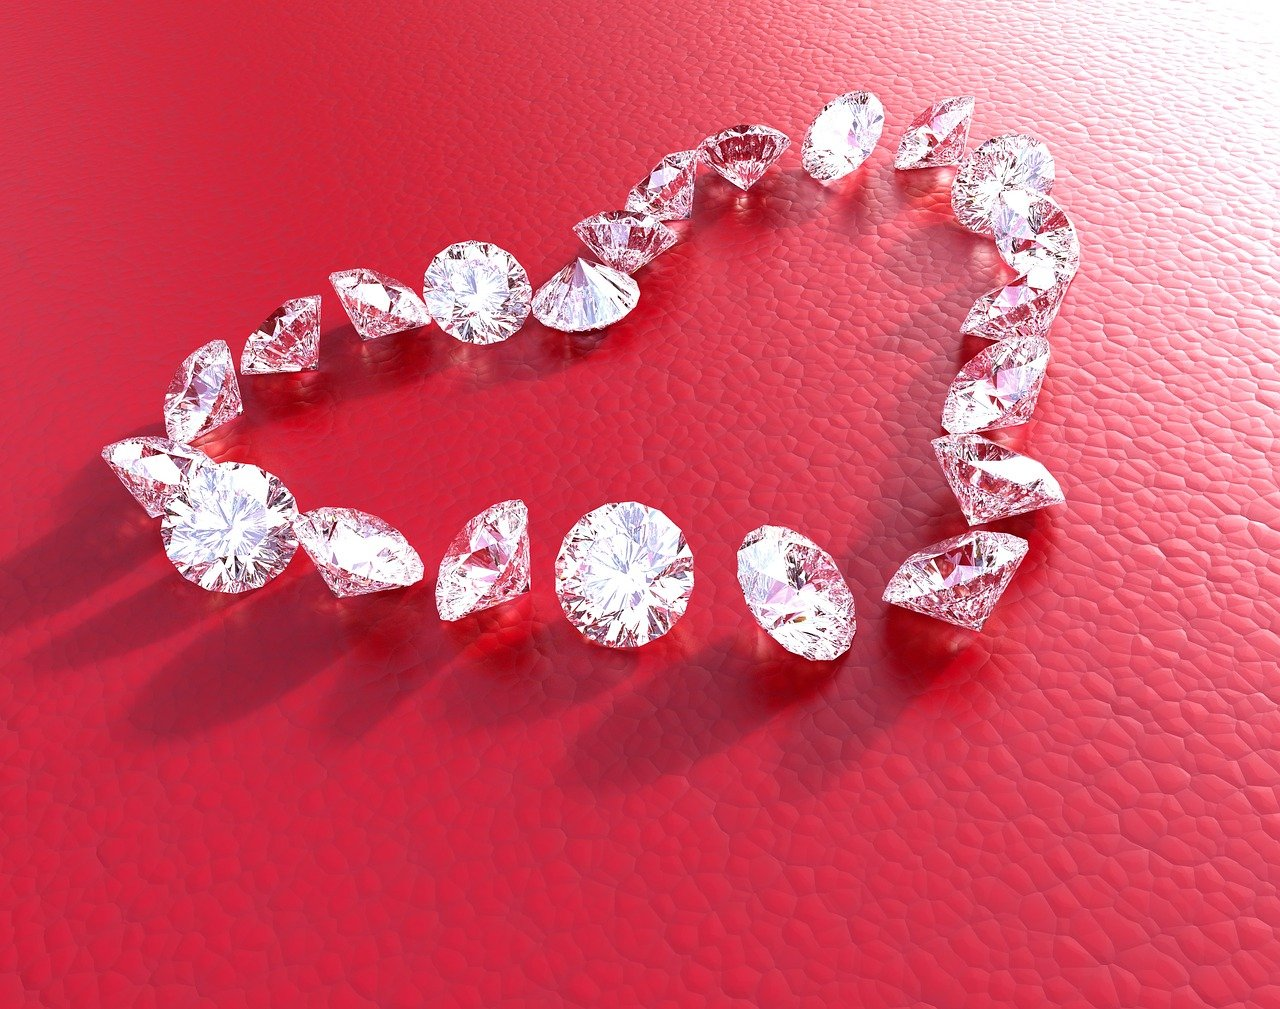 diamonds-2713667_1280.jpg